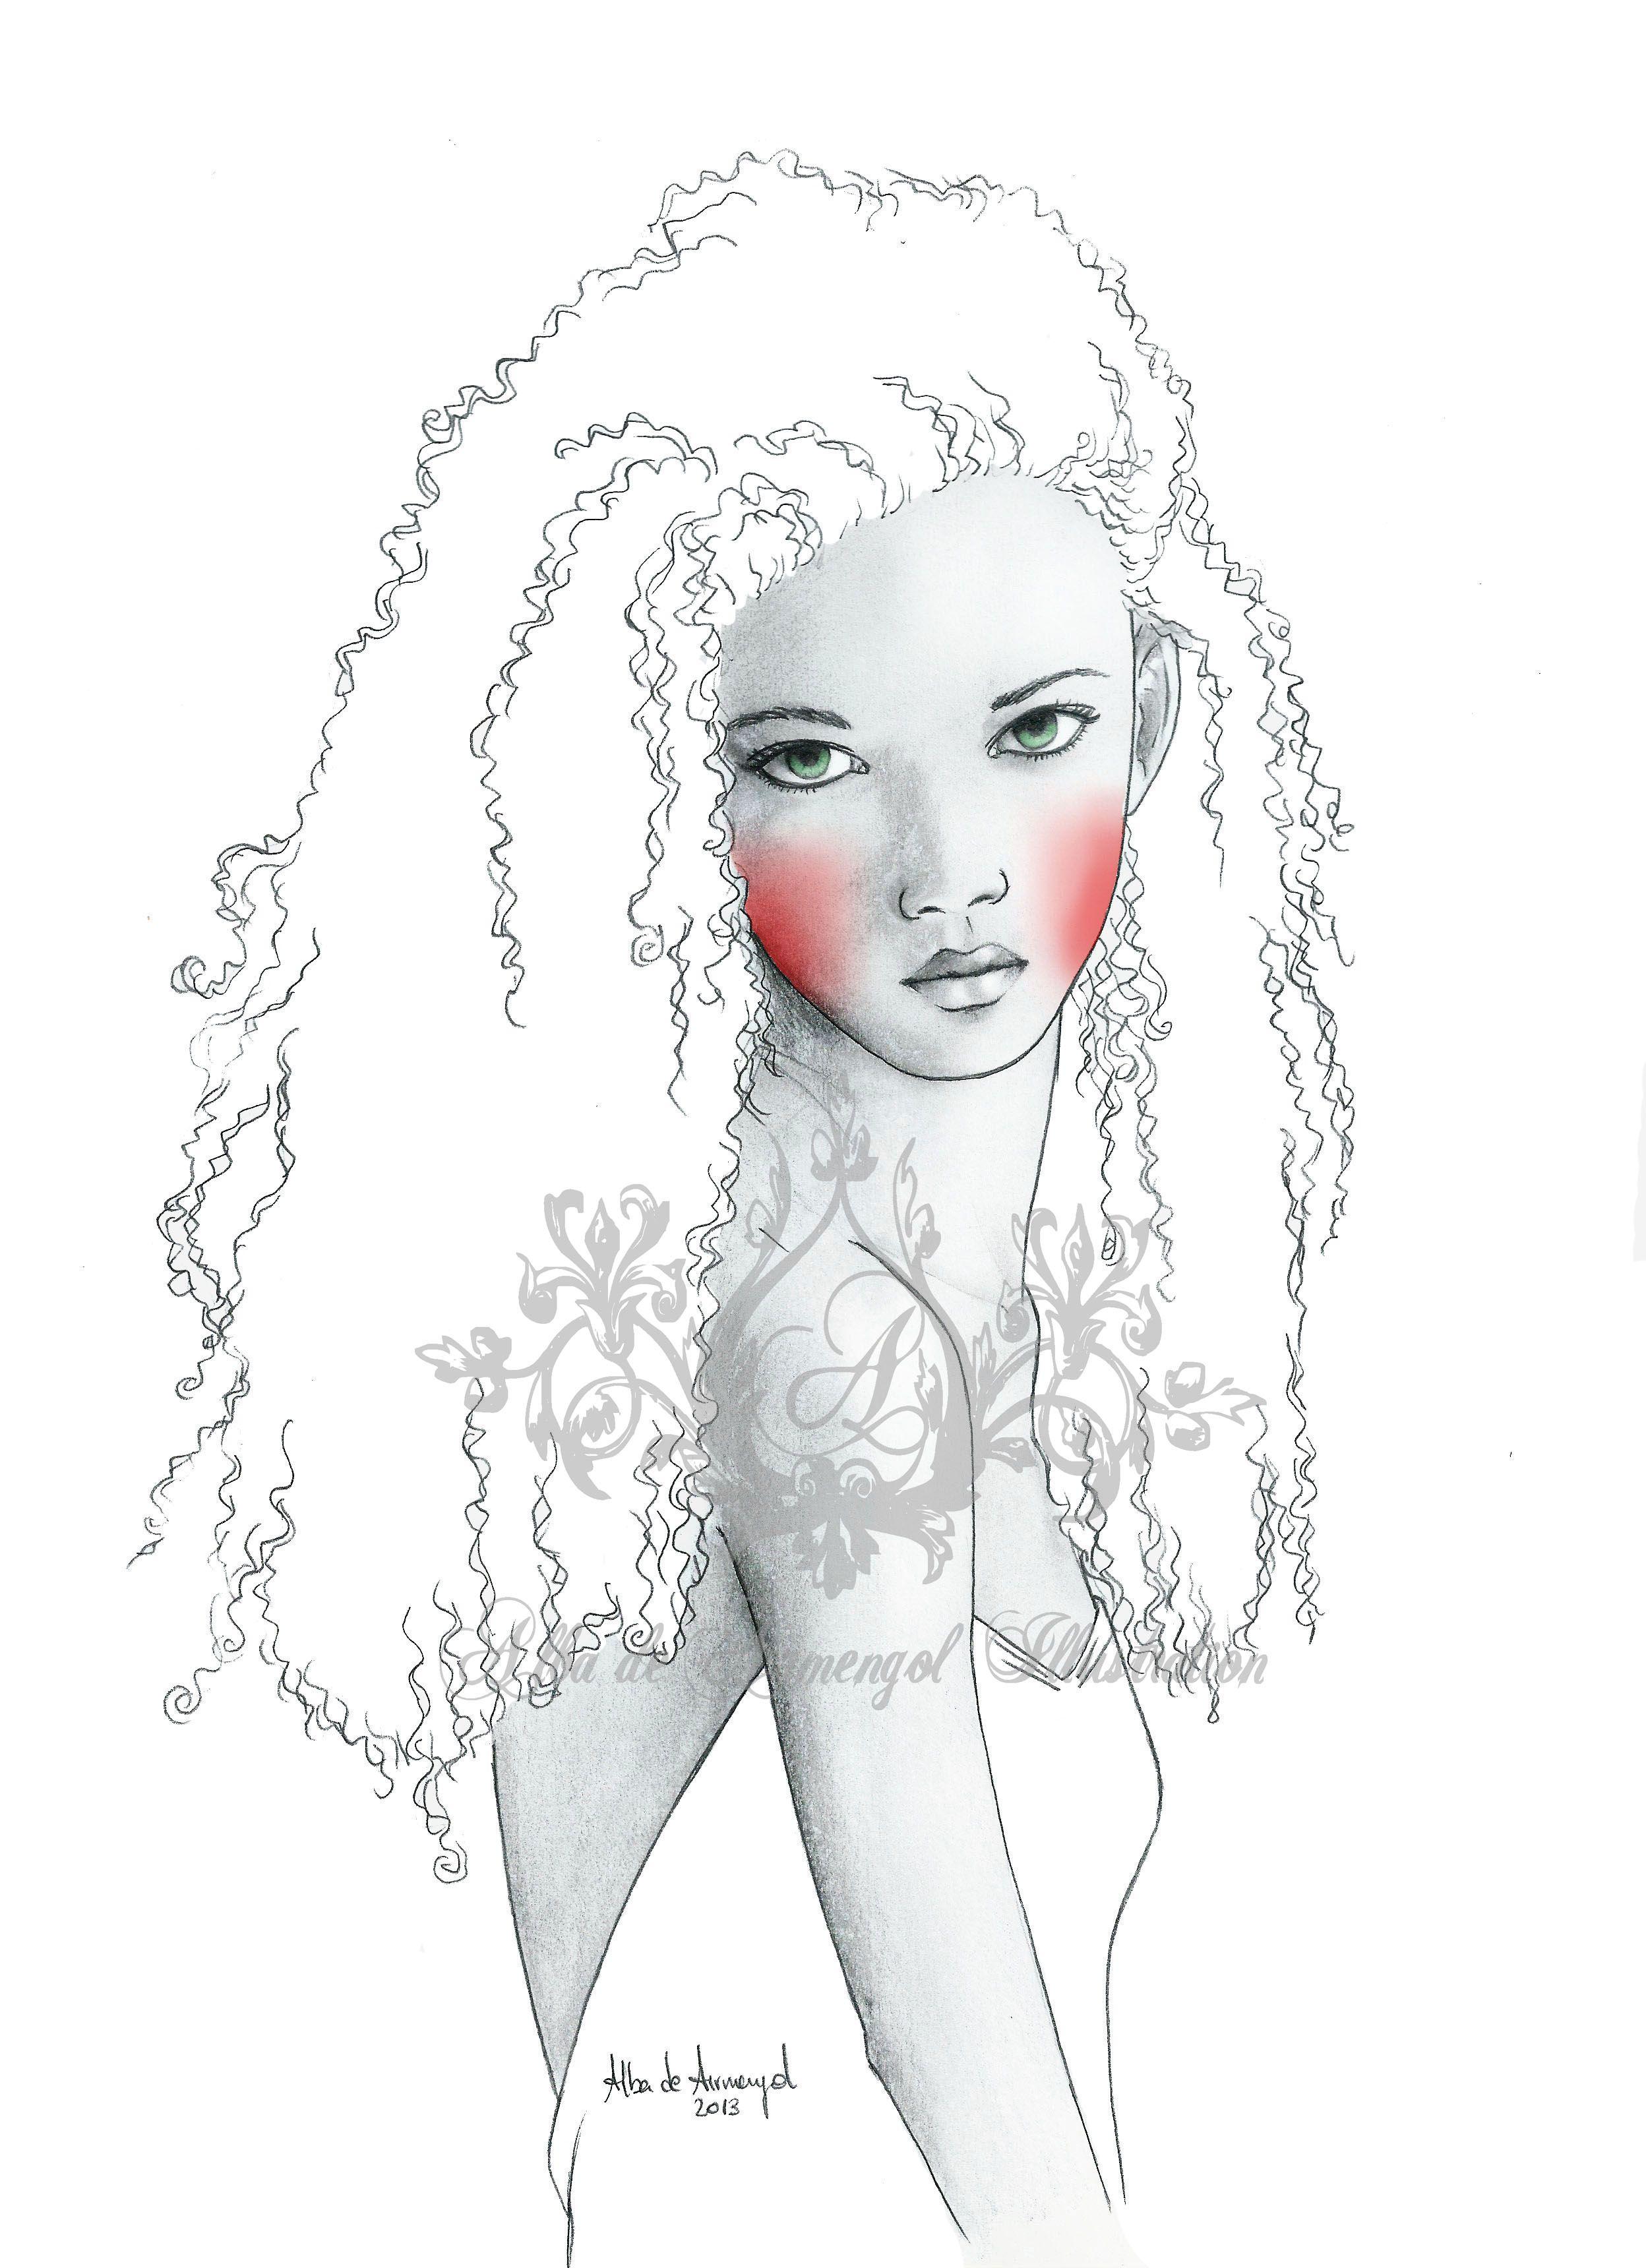 alba de armengol illustration